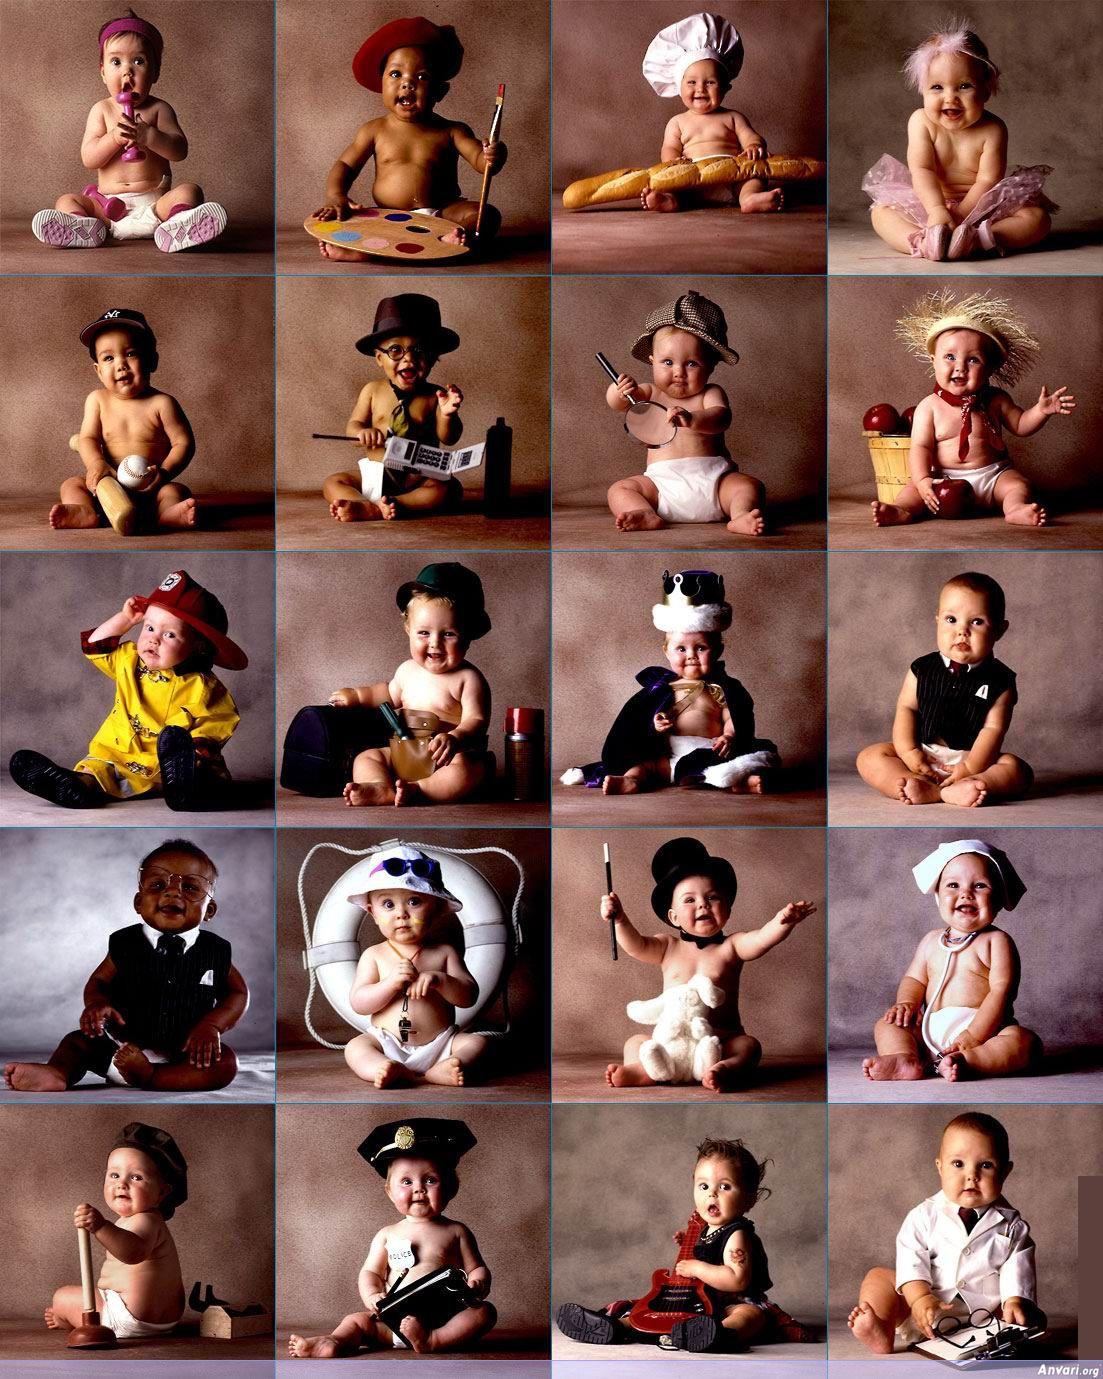 http://www.anvari.org/db/fun/Cute_Kids/Cute_Babies.jpg